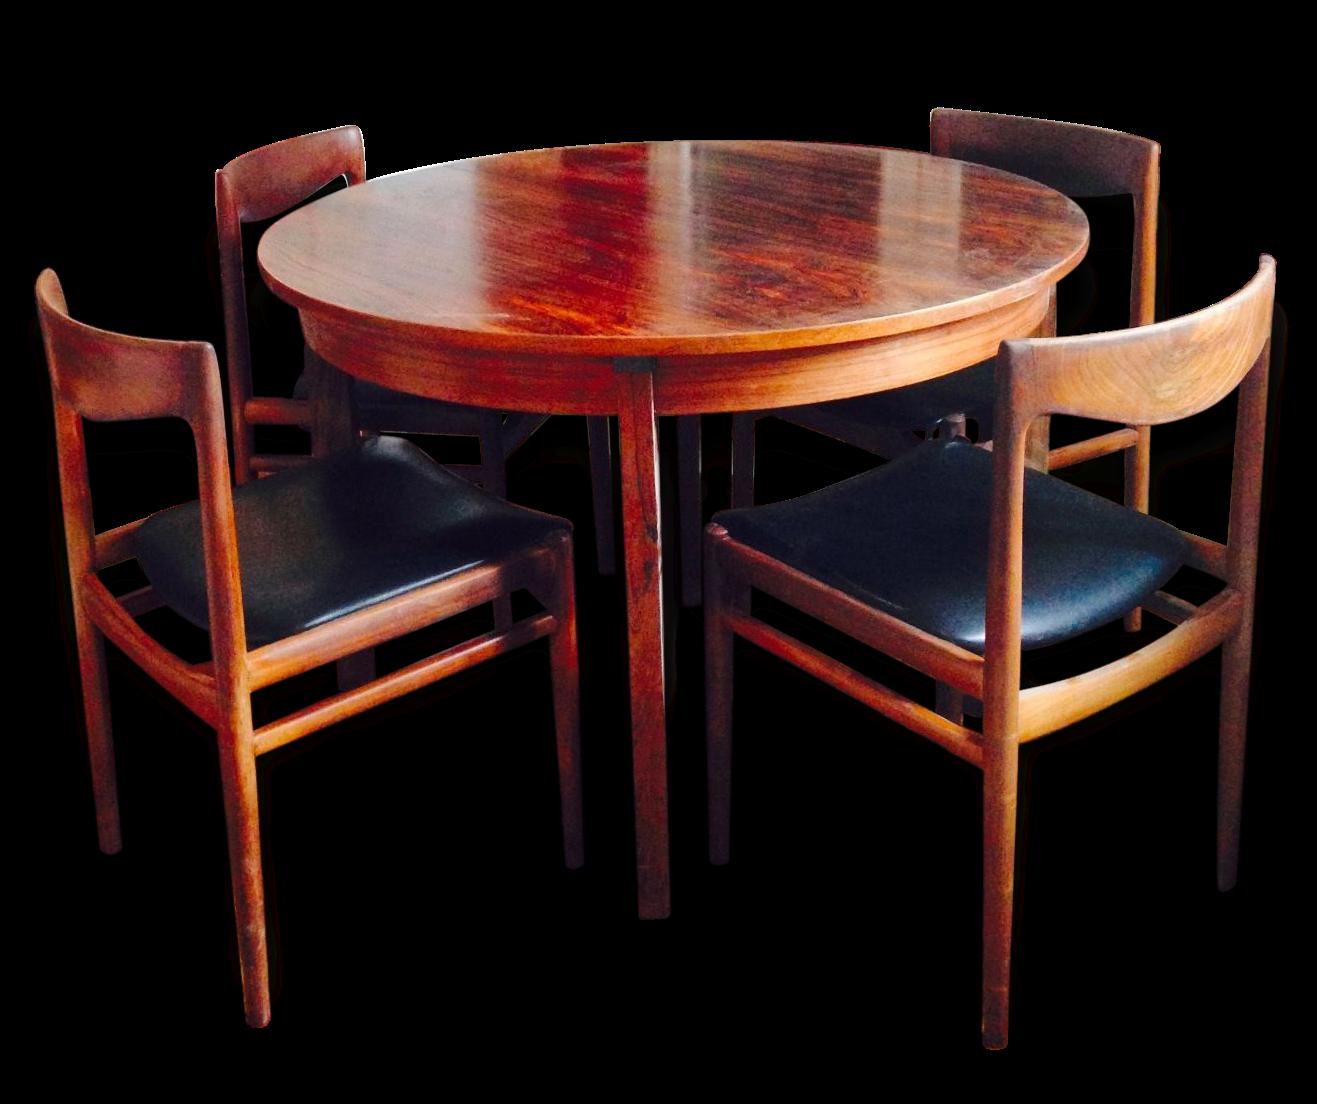 Stunning chaises salle a manger roche bobois gallery for Salle a manger 4 chaises